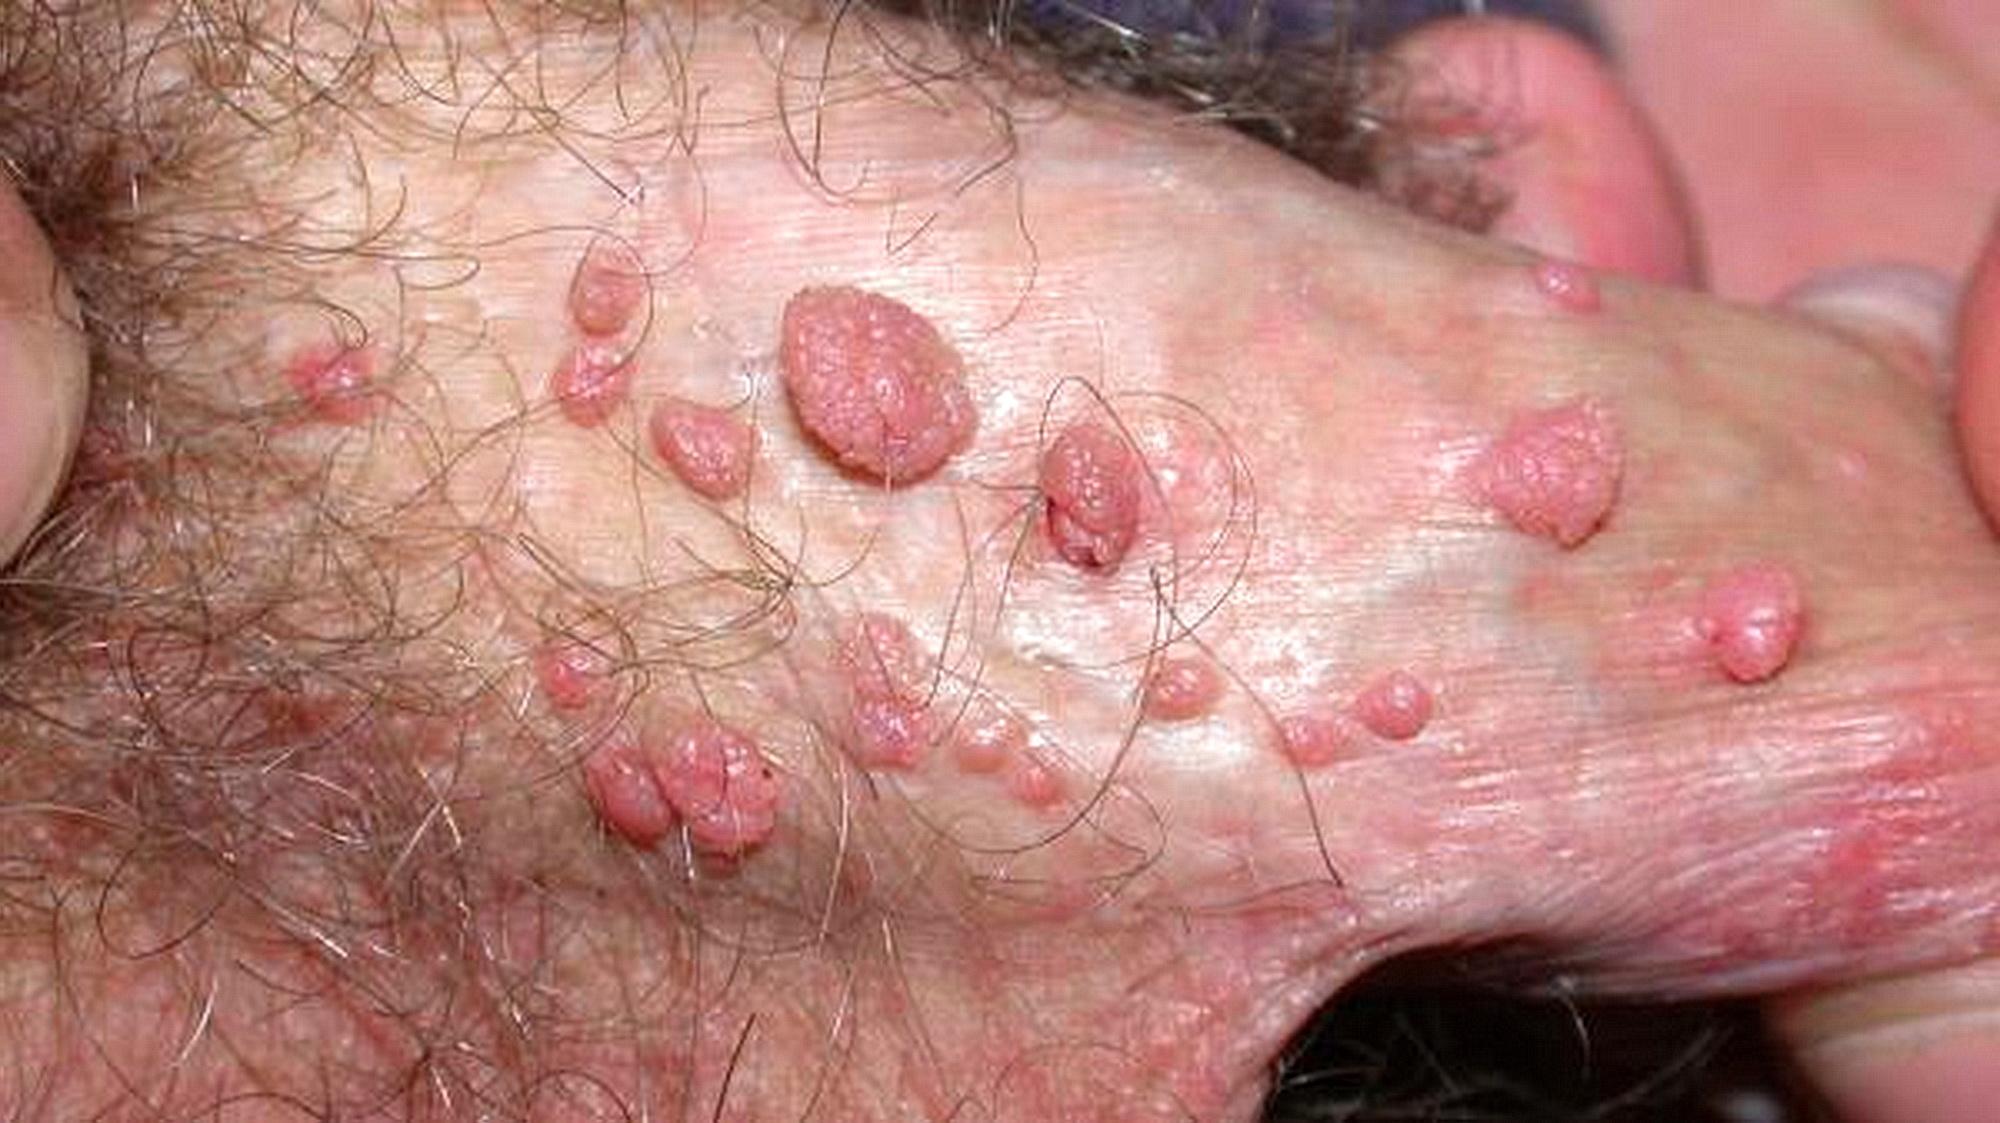 papilloma genitale femminile